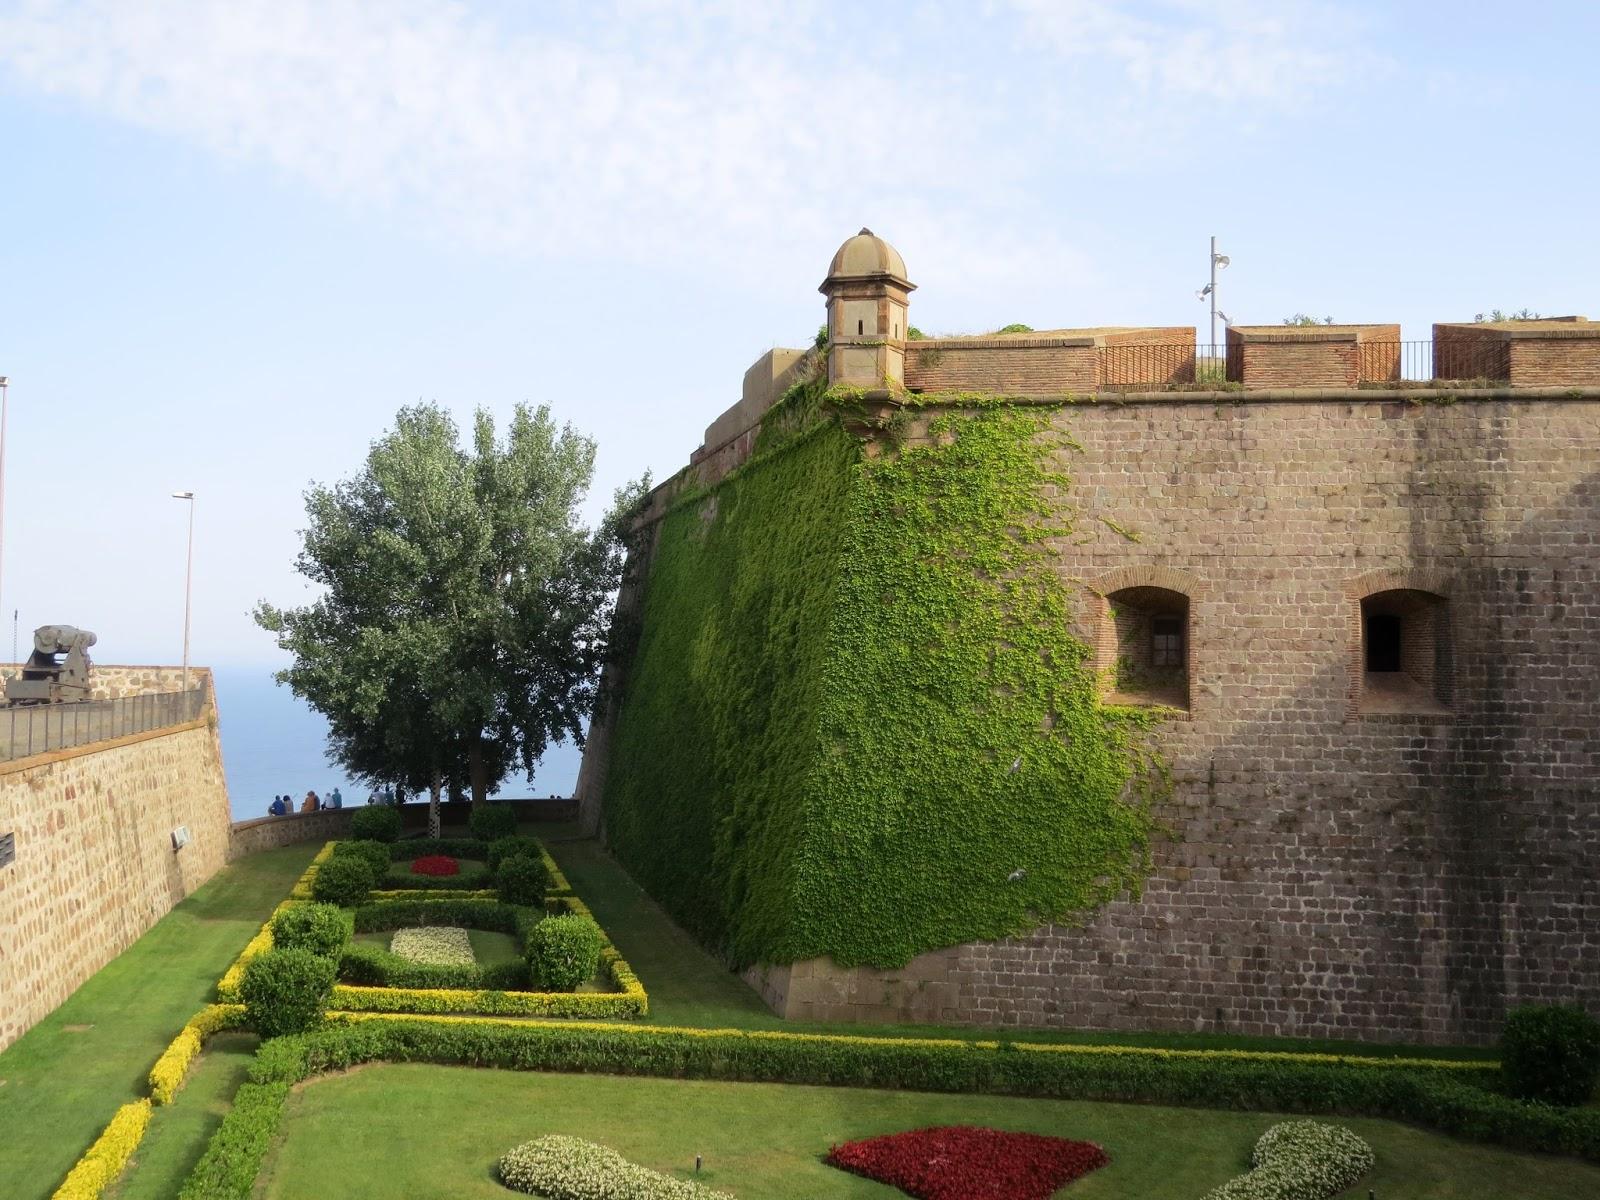 Vista externa do castelo de Montjuic